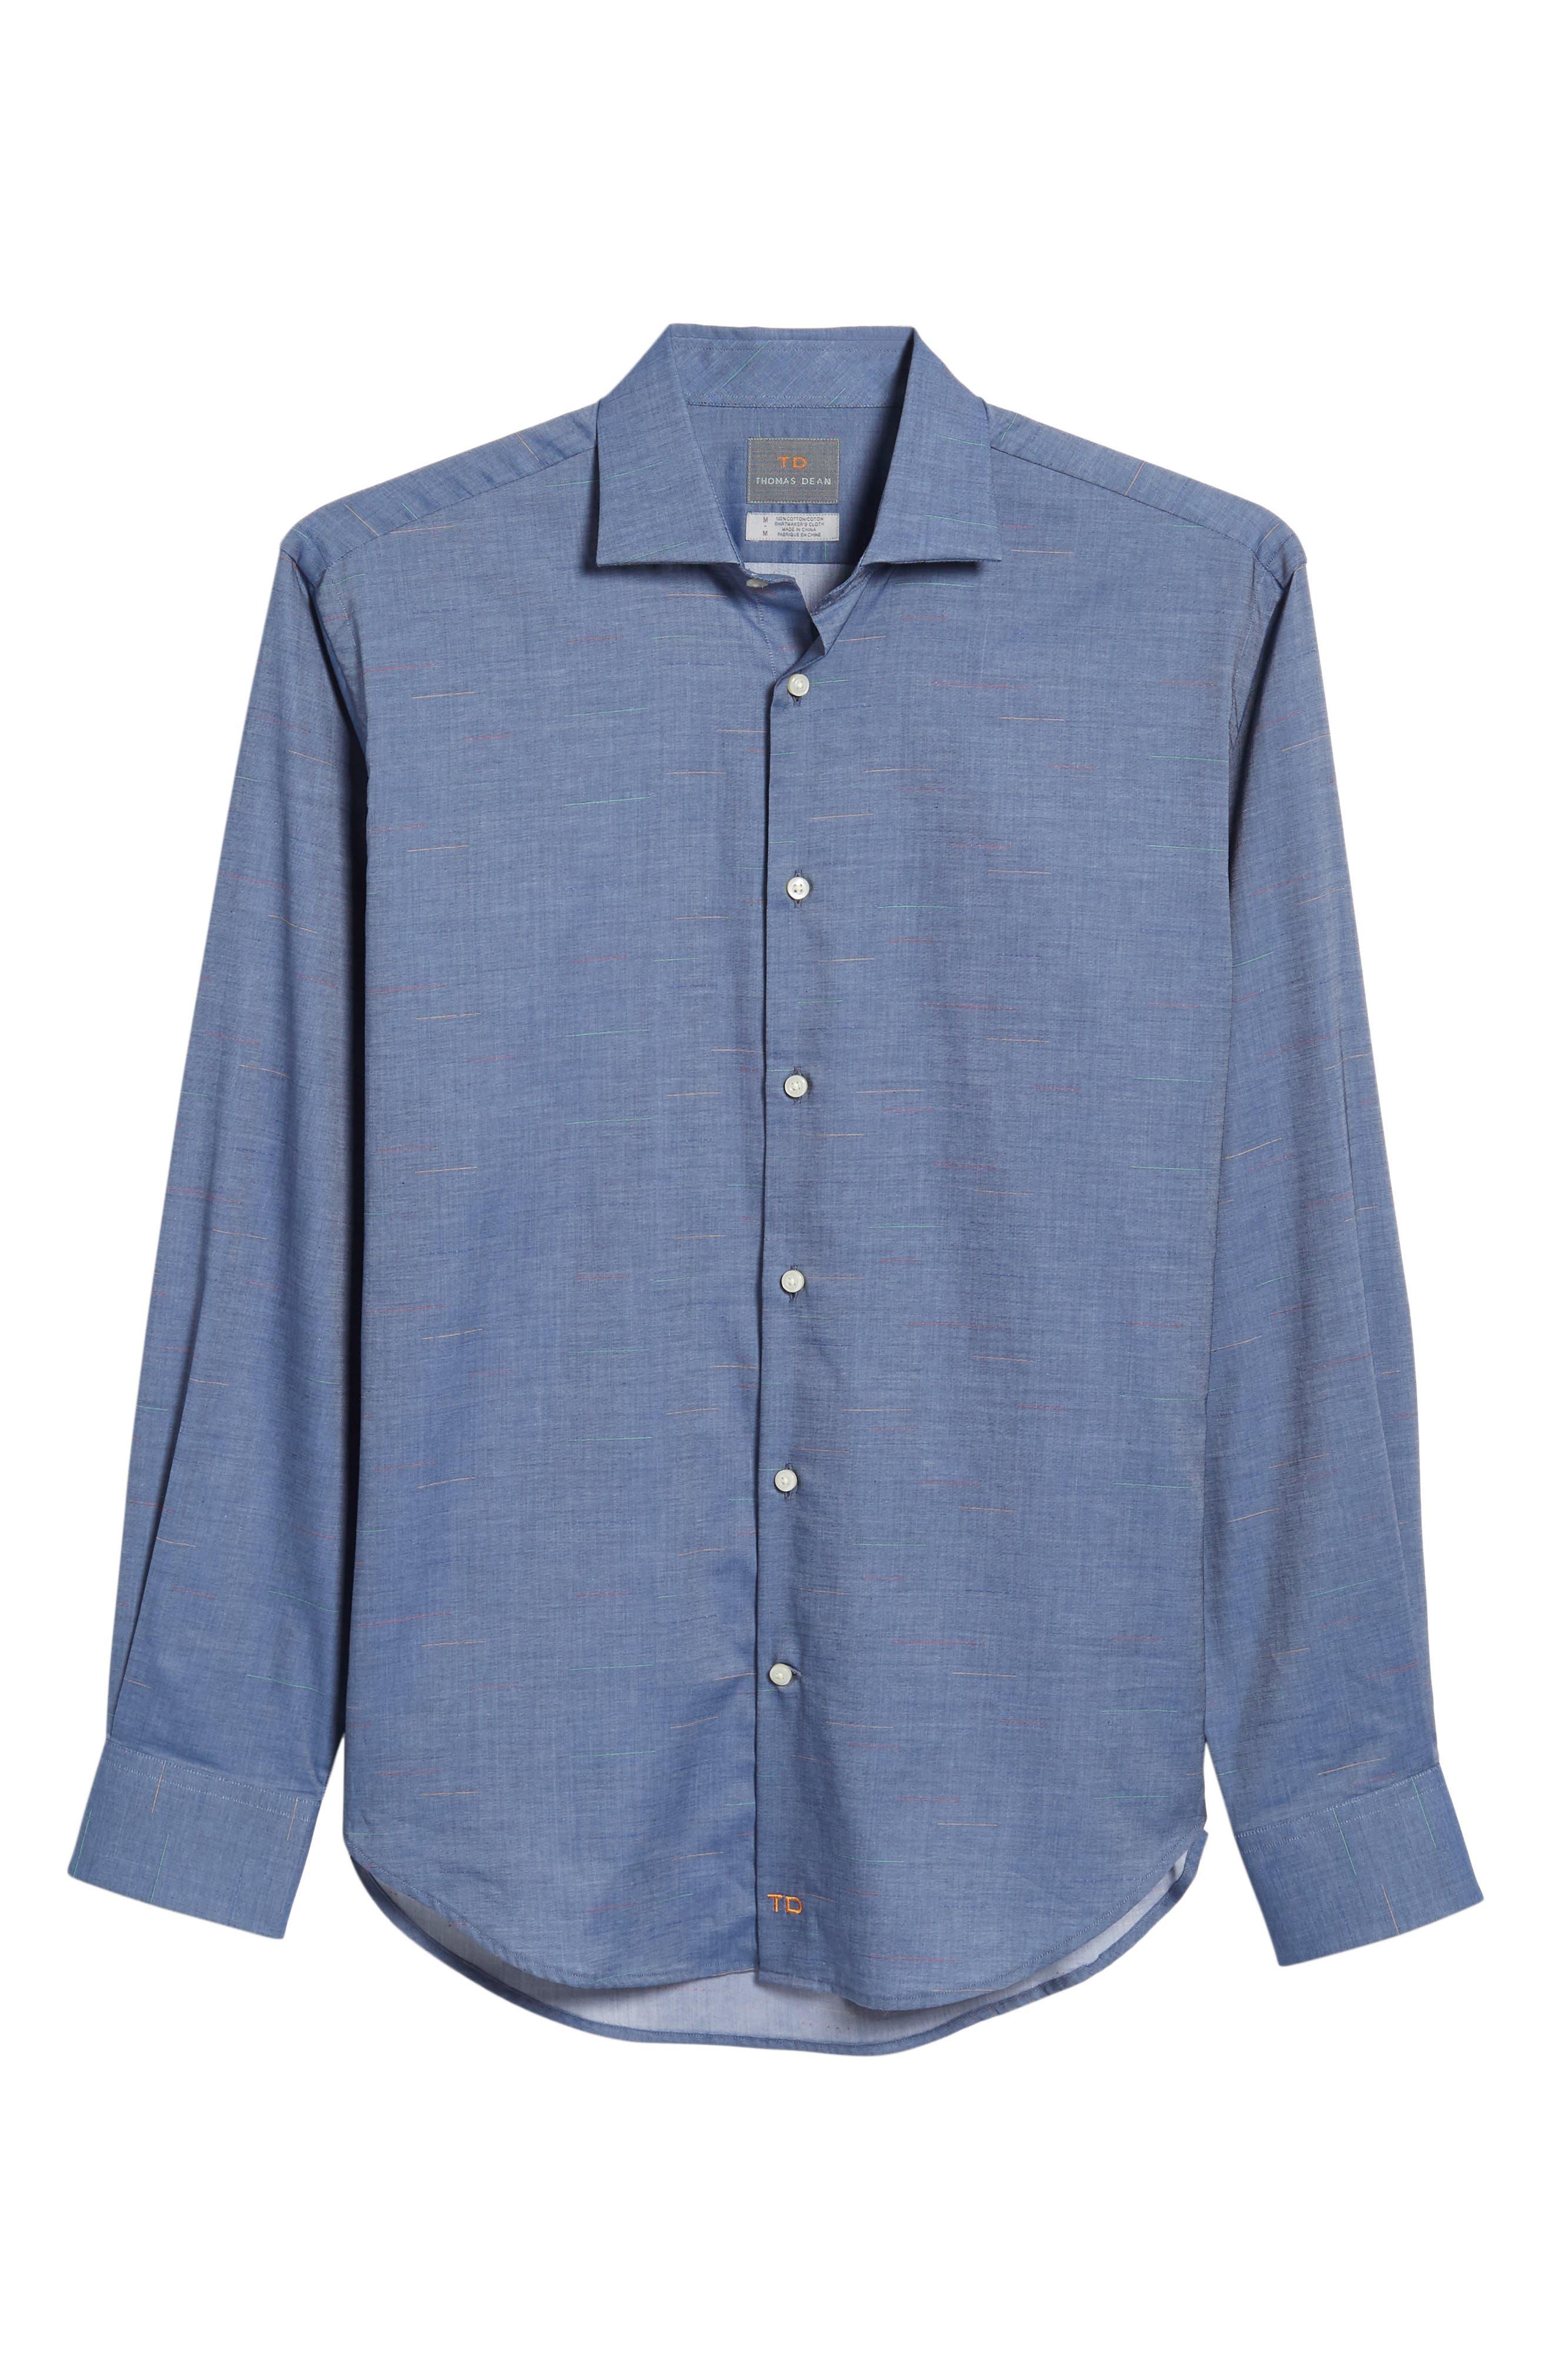 Regular Fit Chambray Sport Shirt,                             Alternate thumbnail 6, color,                             Blue